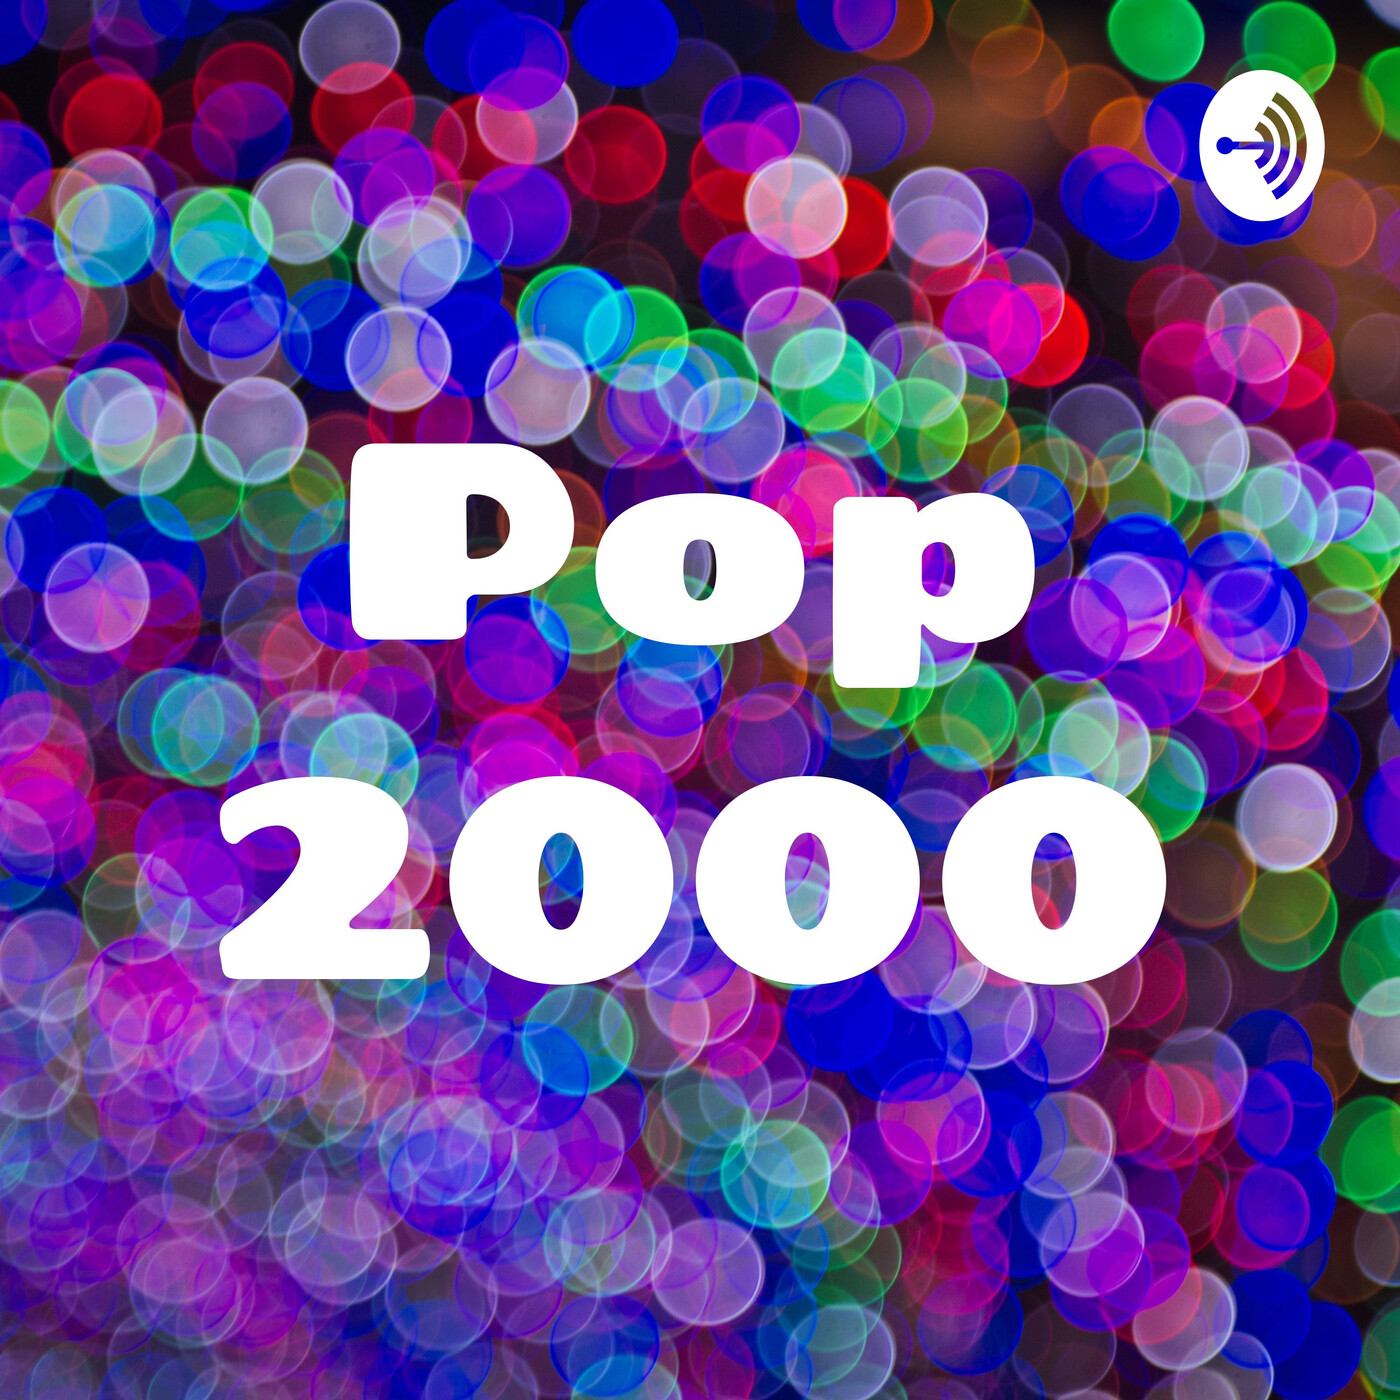 Pop 2000 - By DJ Bruno Songz